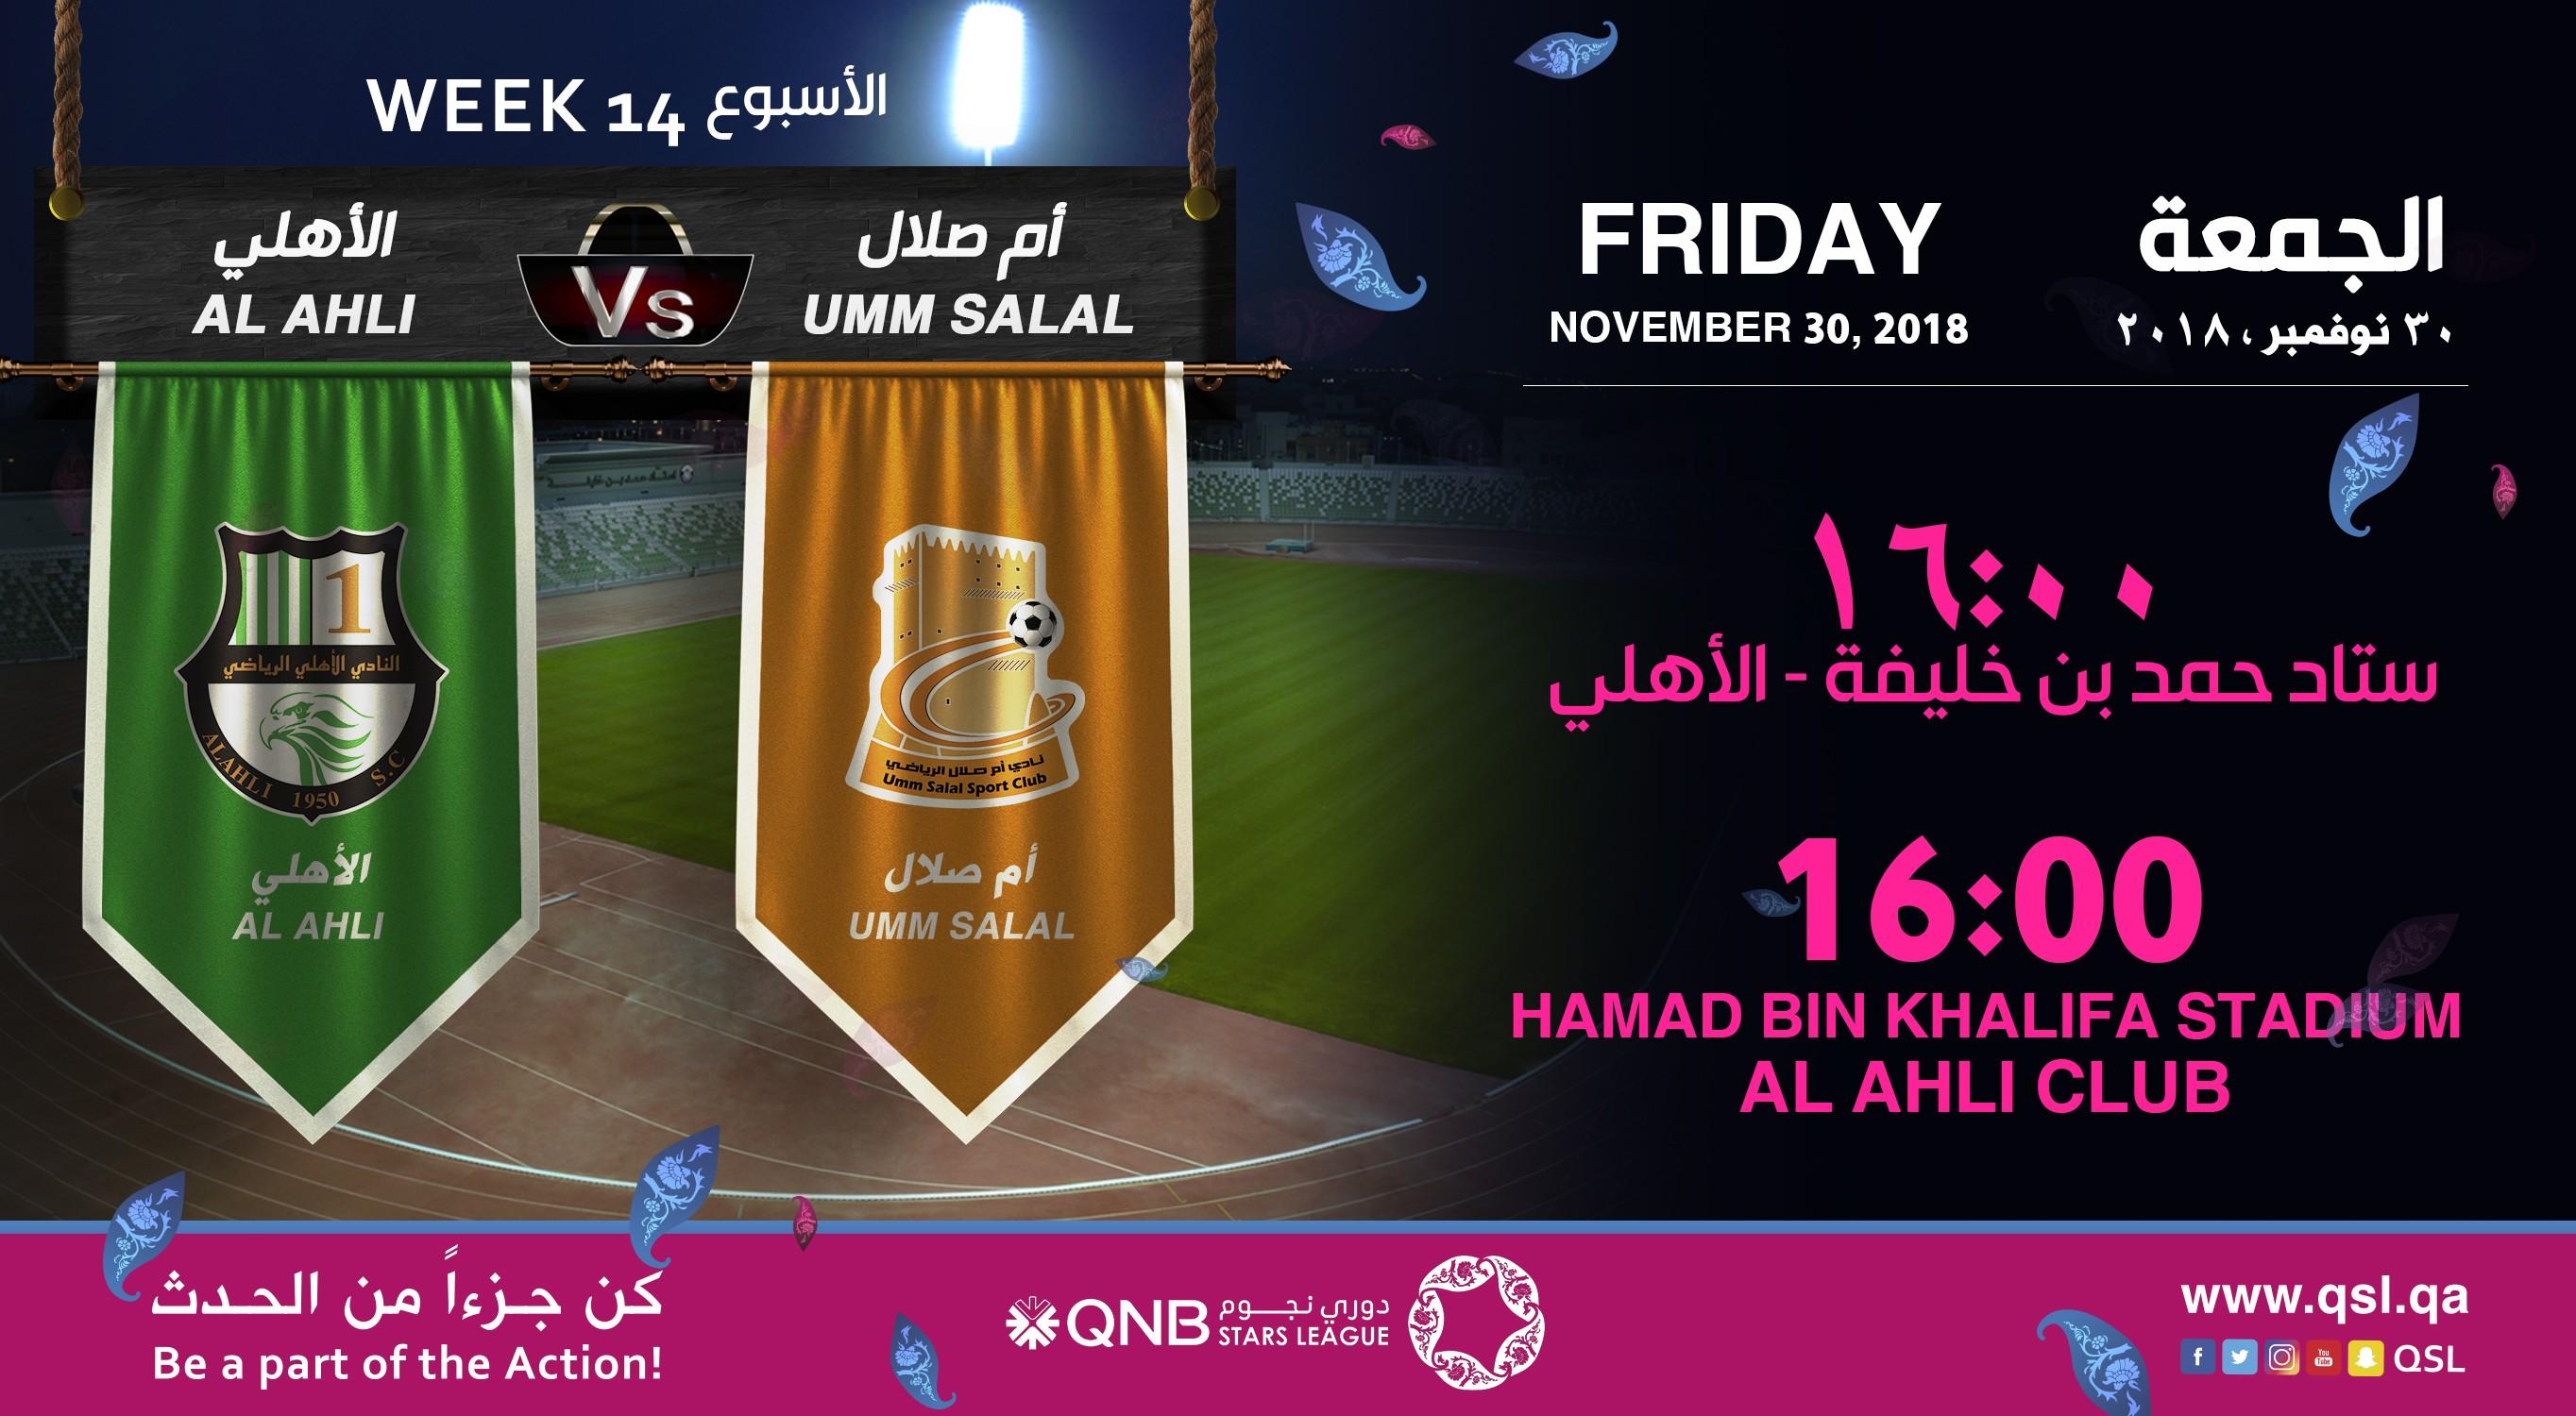 QNB Stars League Week 14 — Al Ahli vs Umm Salal